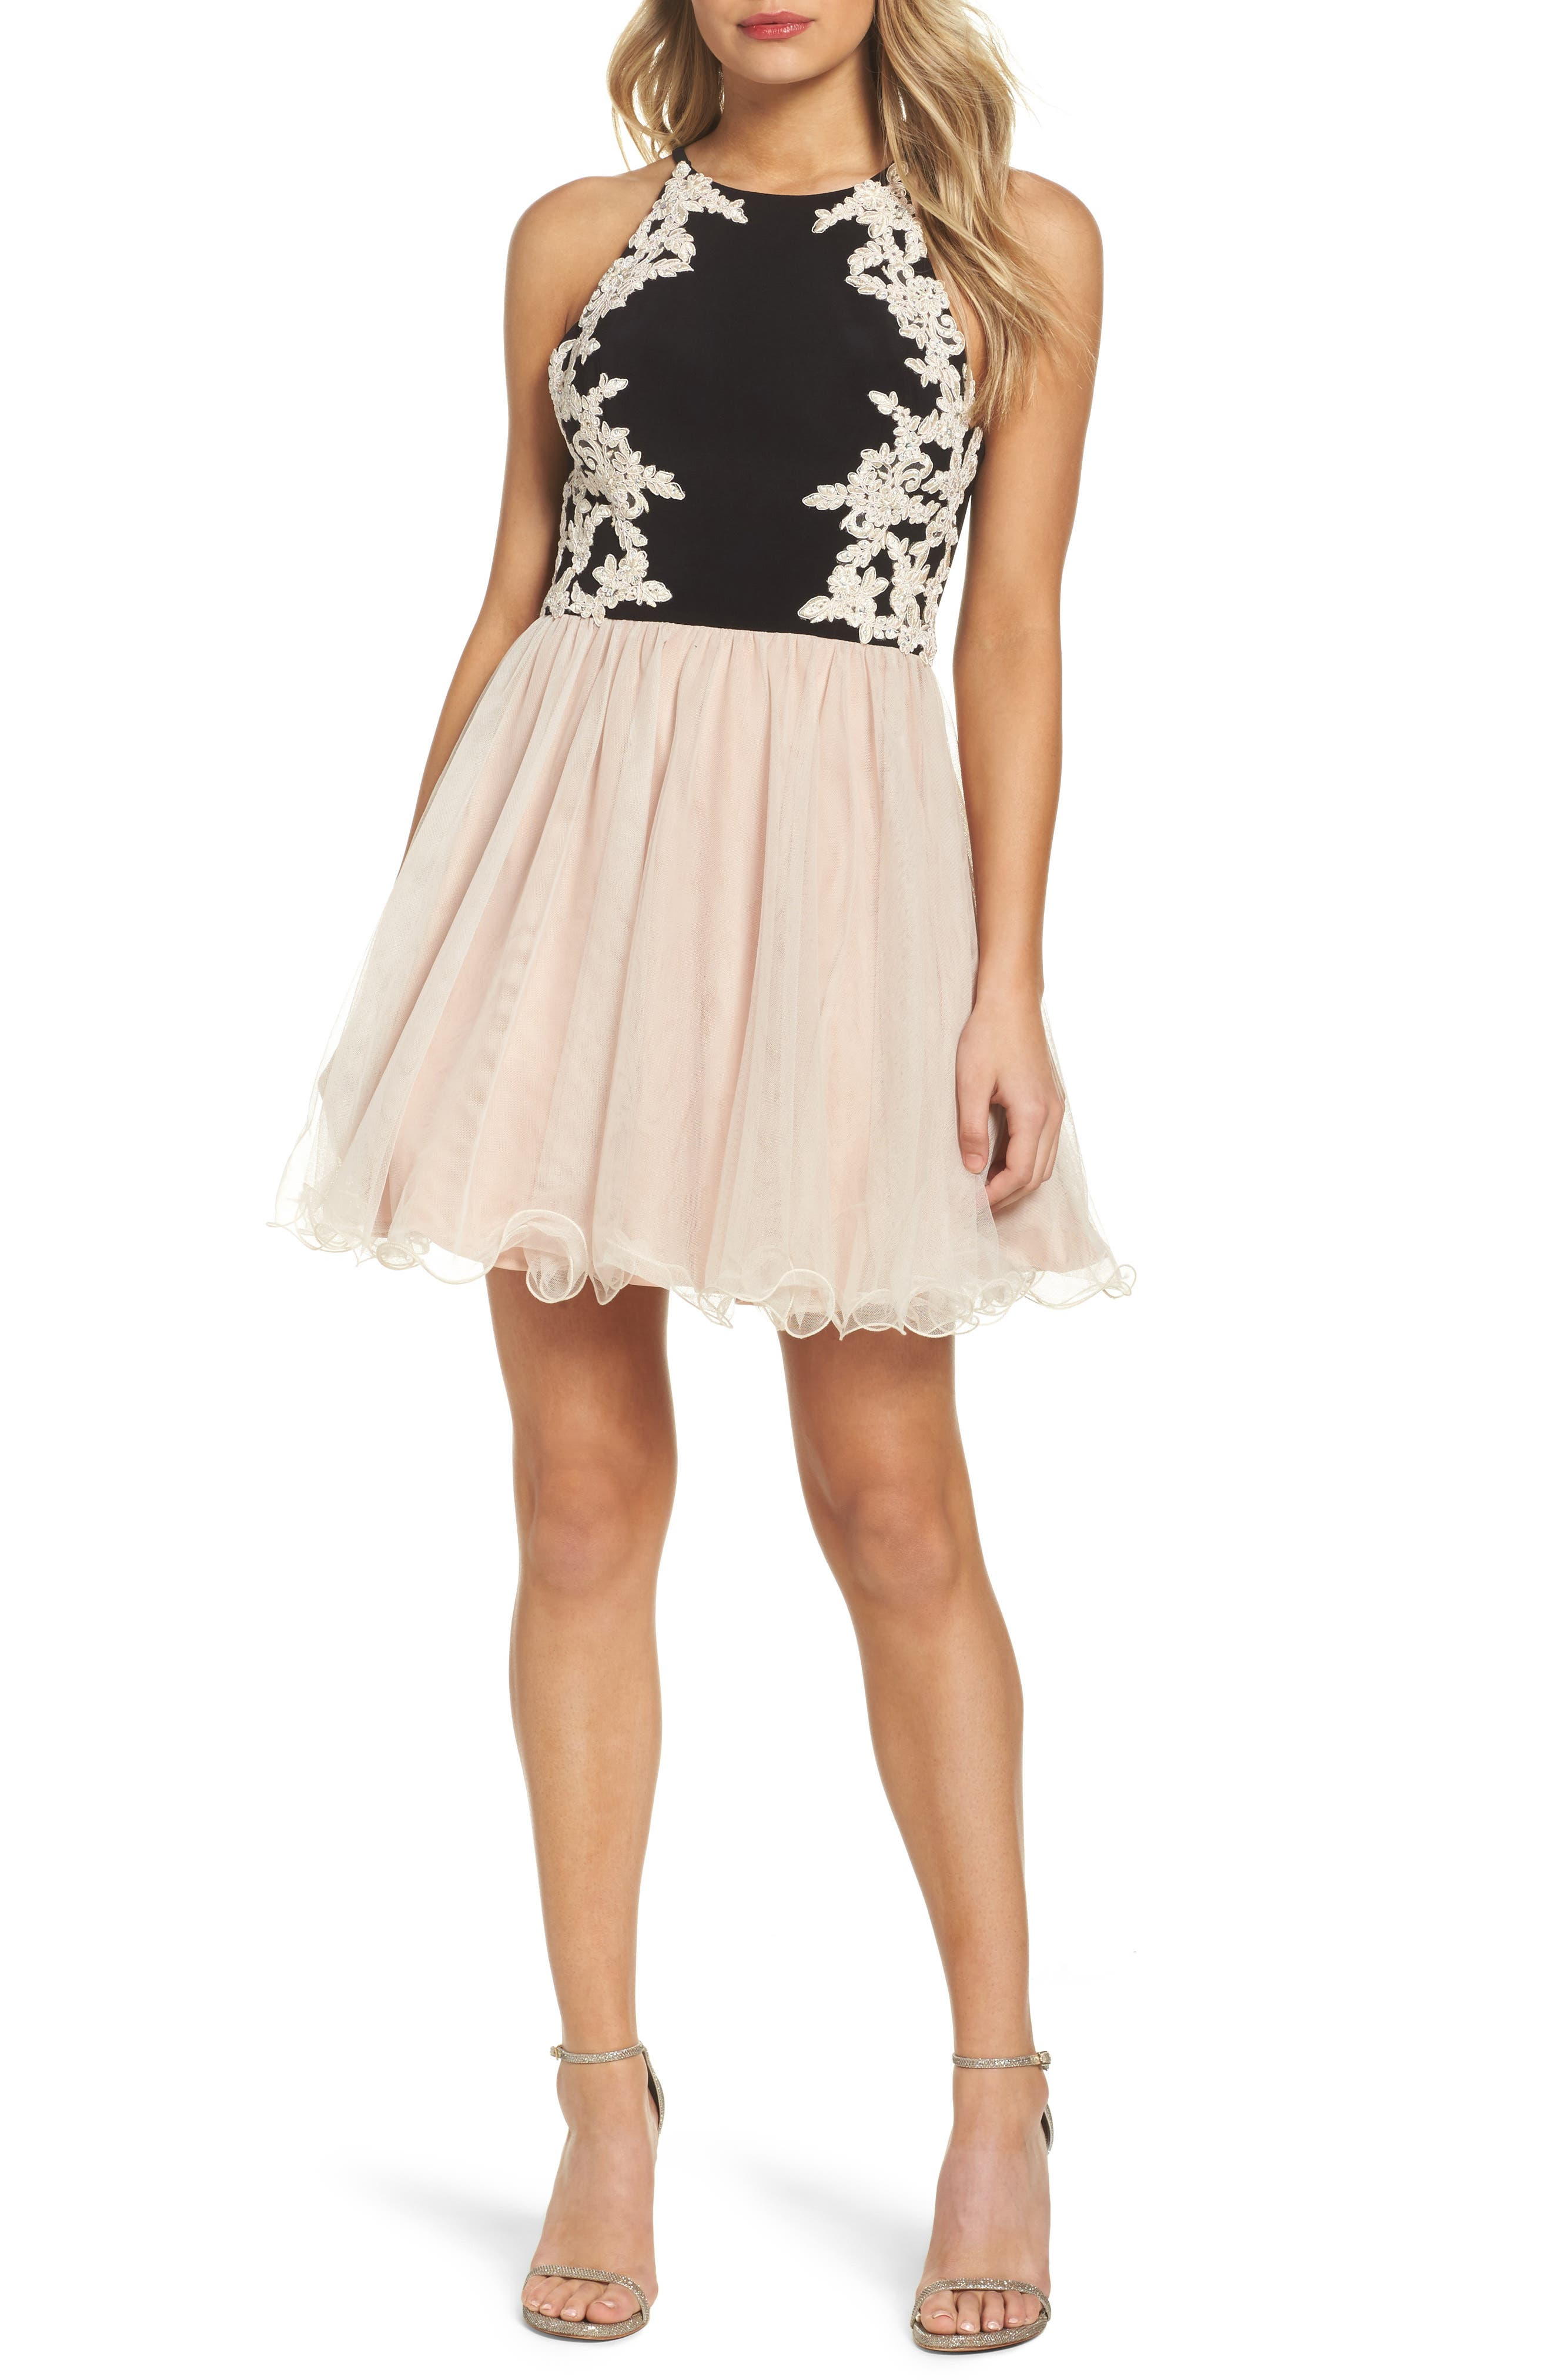 Main Image - Blondie Nites Appliqué Fit & Flare Dress